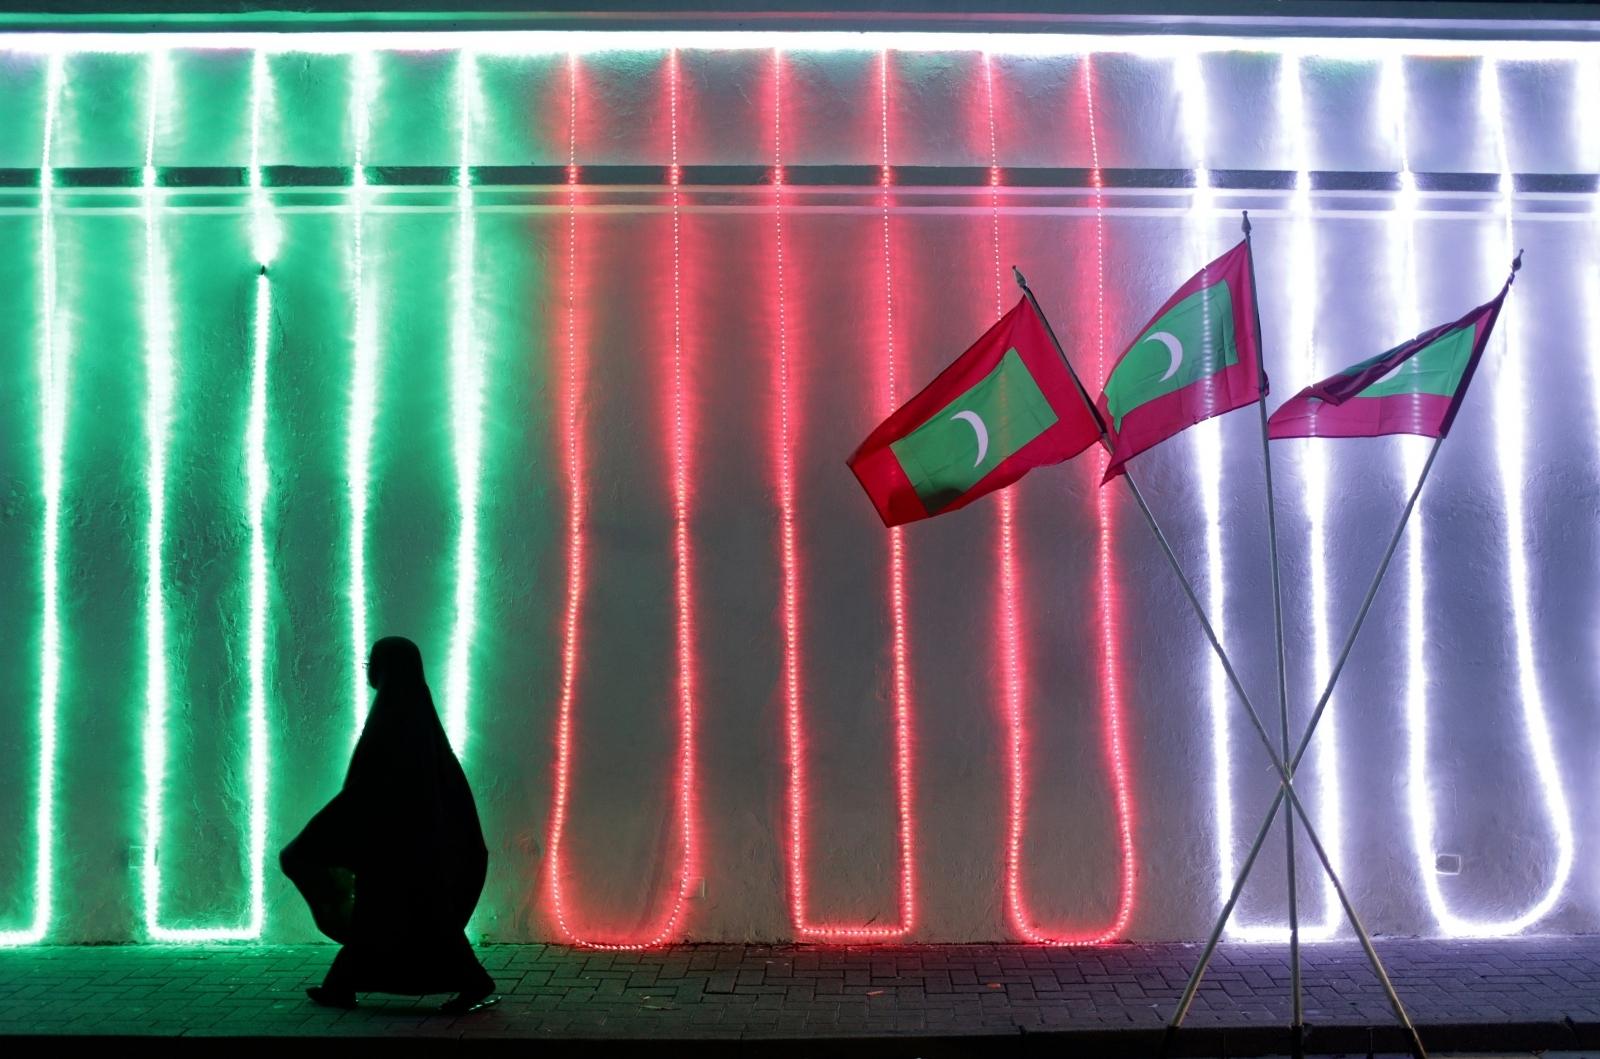 Maldives flags